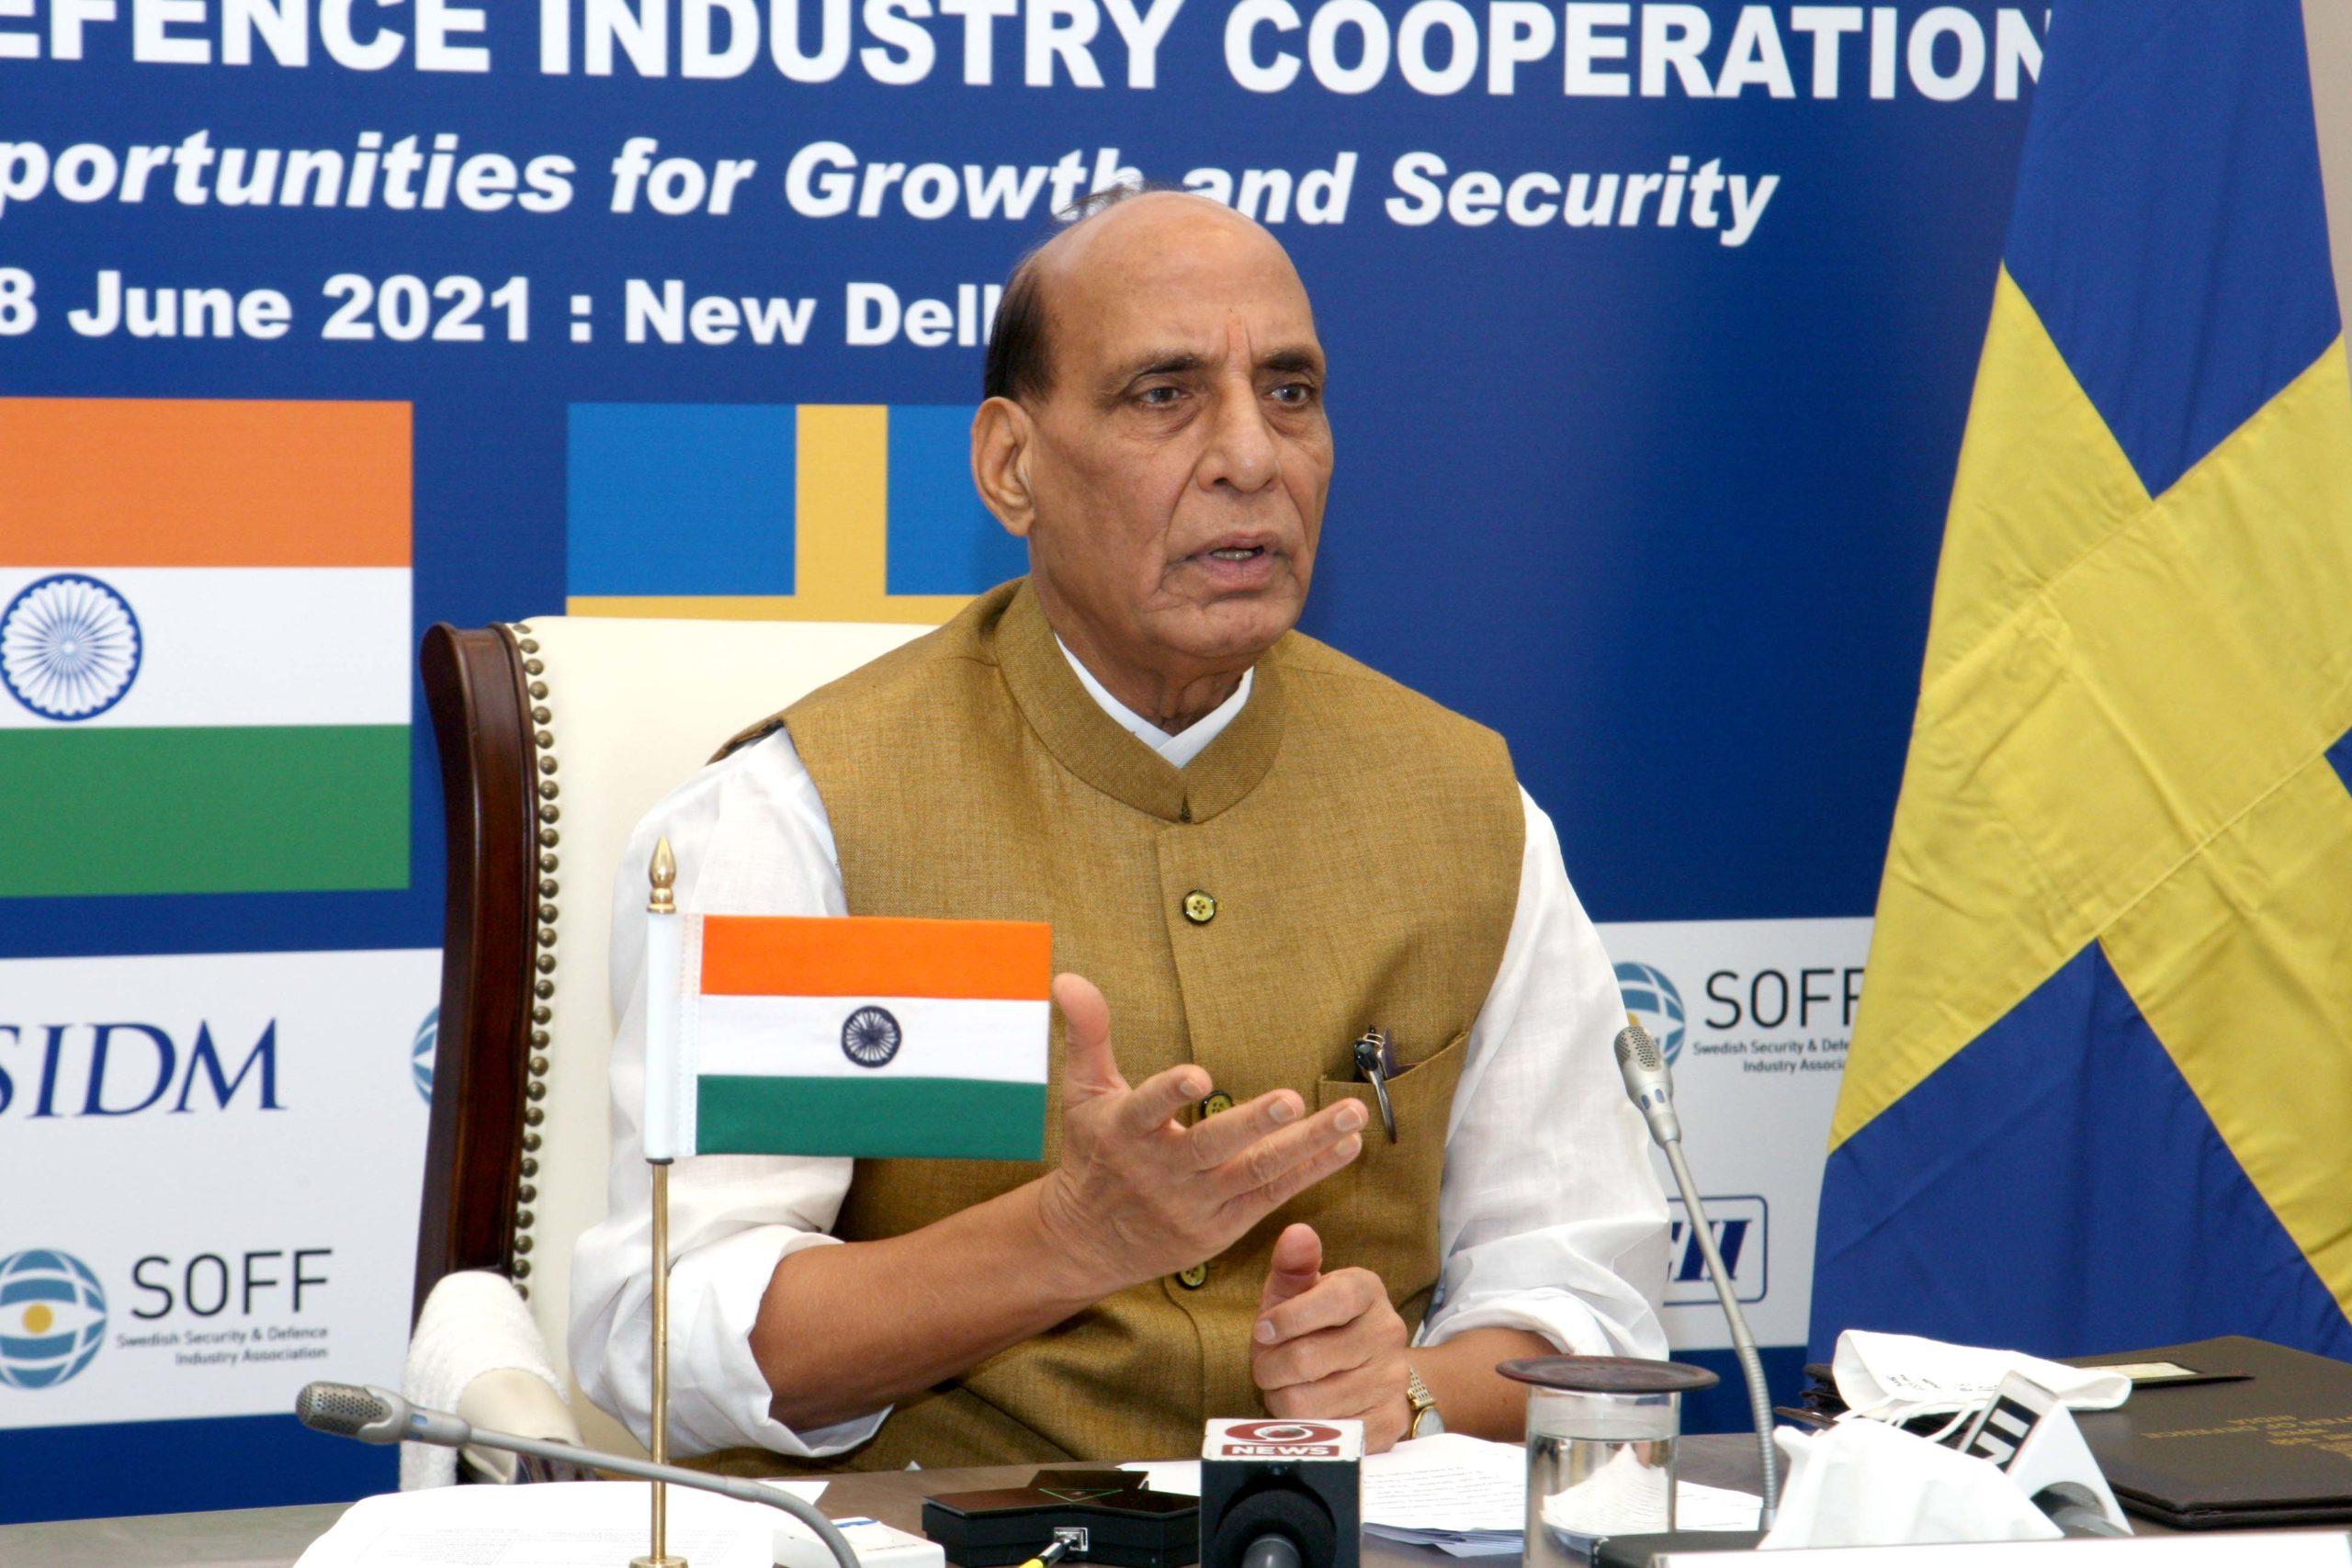 Raksha Mantri invites Swedish firms to invest in defence corridors in Uttar Pradesh & Tamil Nadu;